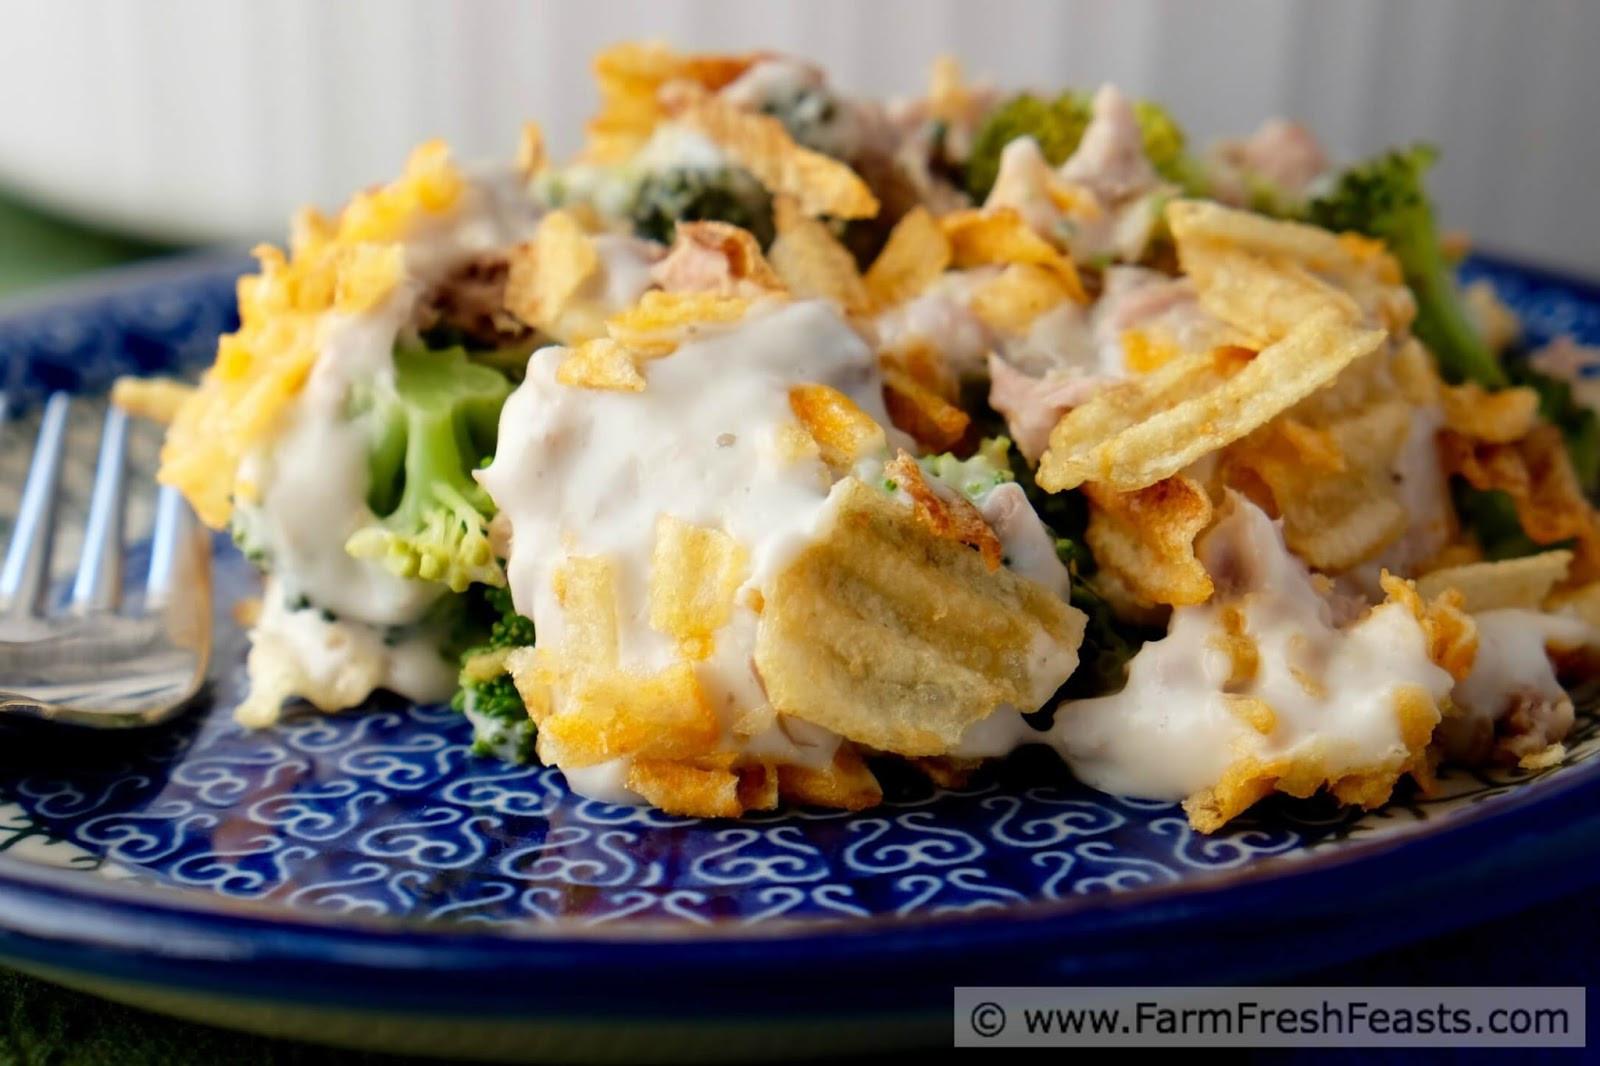 Tuna Noodle Casserole With Potato Chips  tuna noodle casserole with potato chips on top